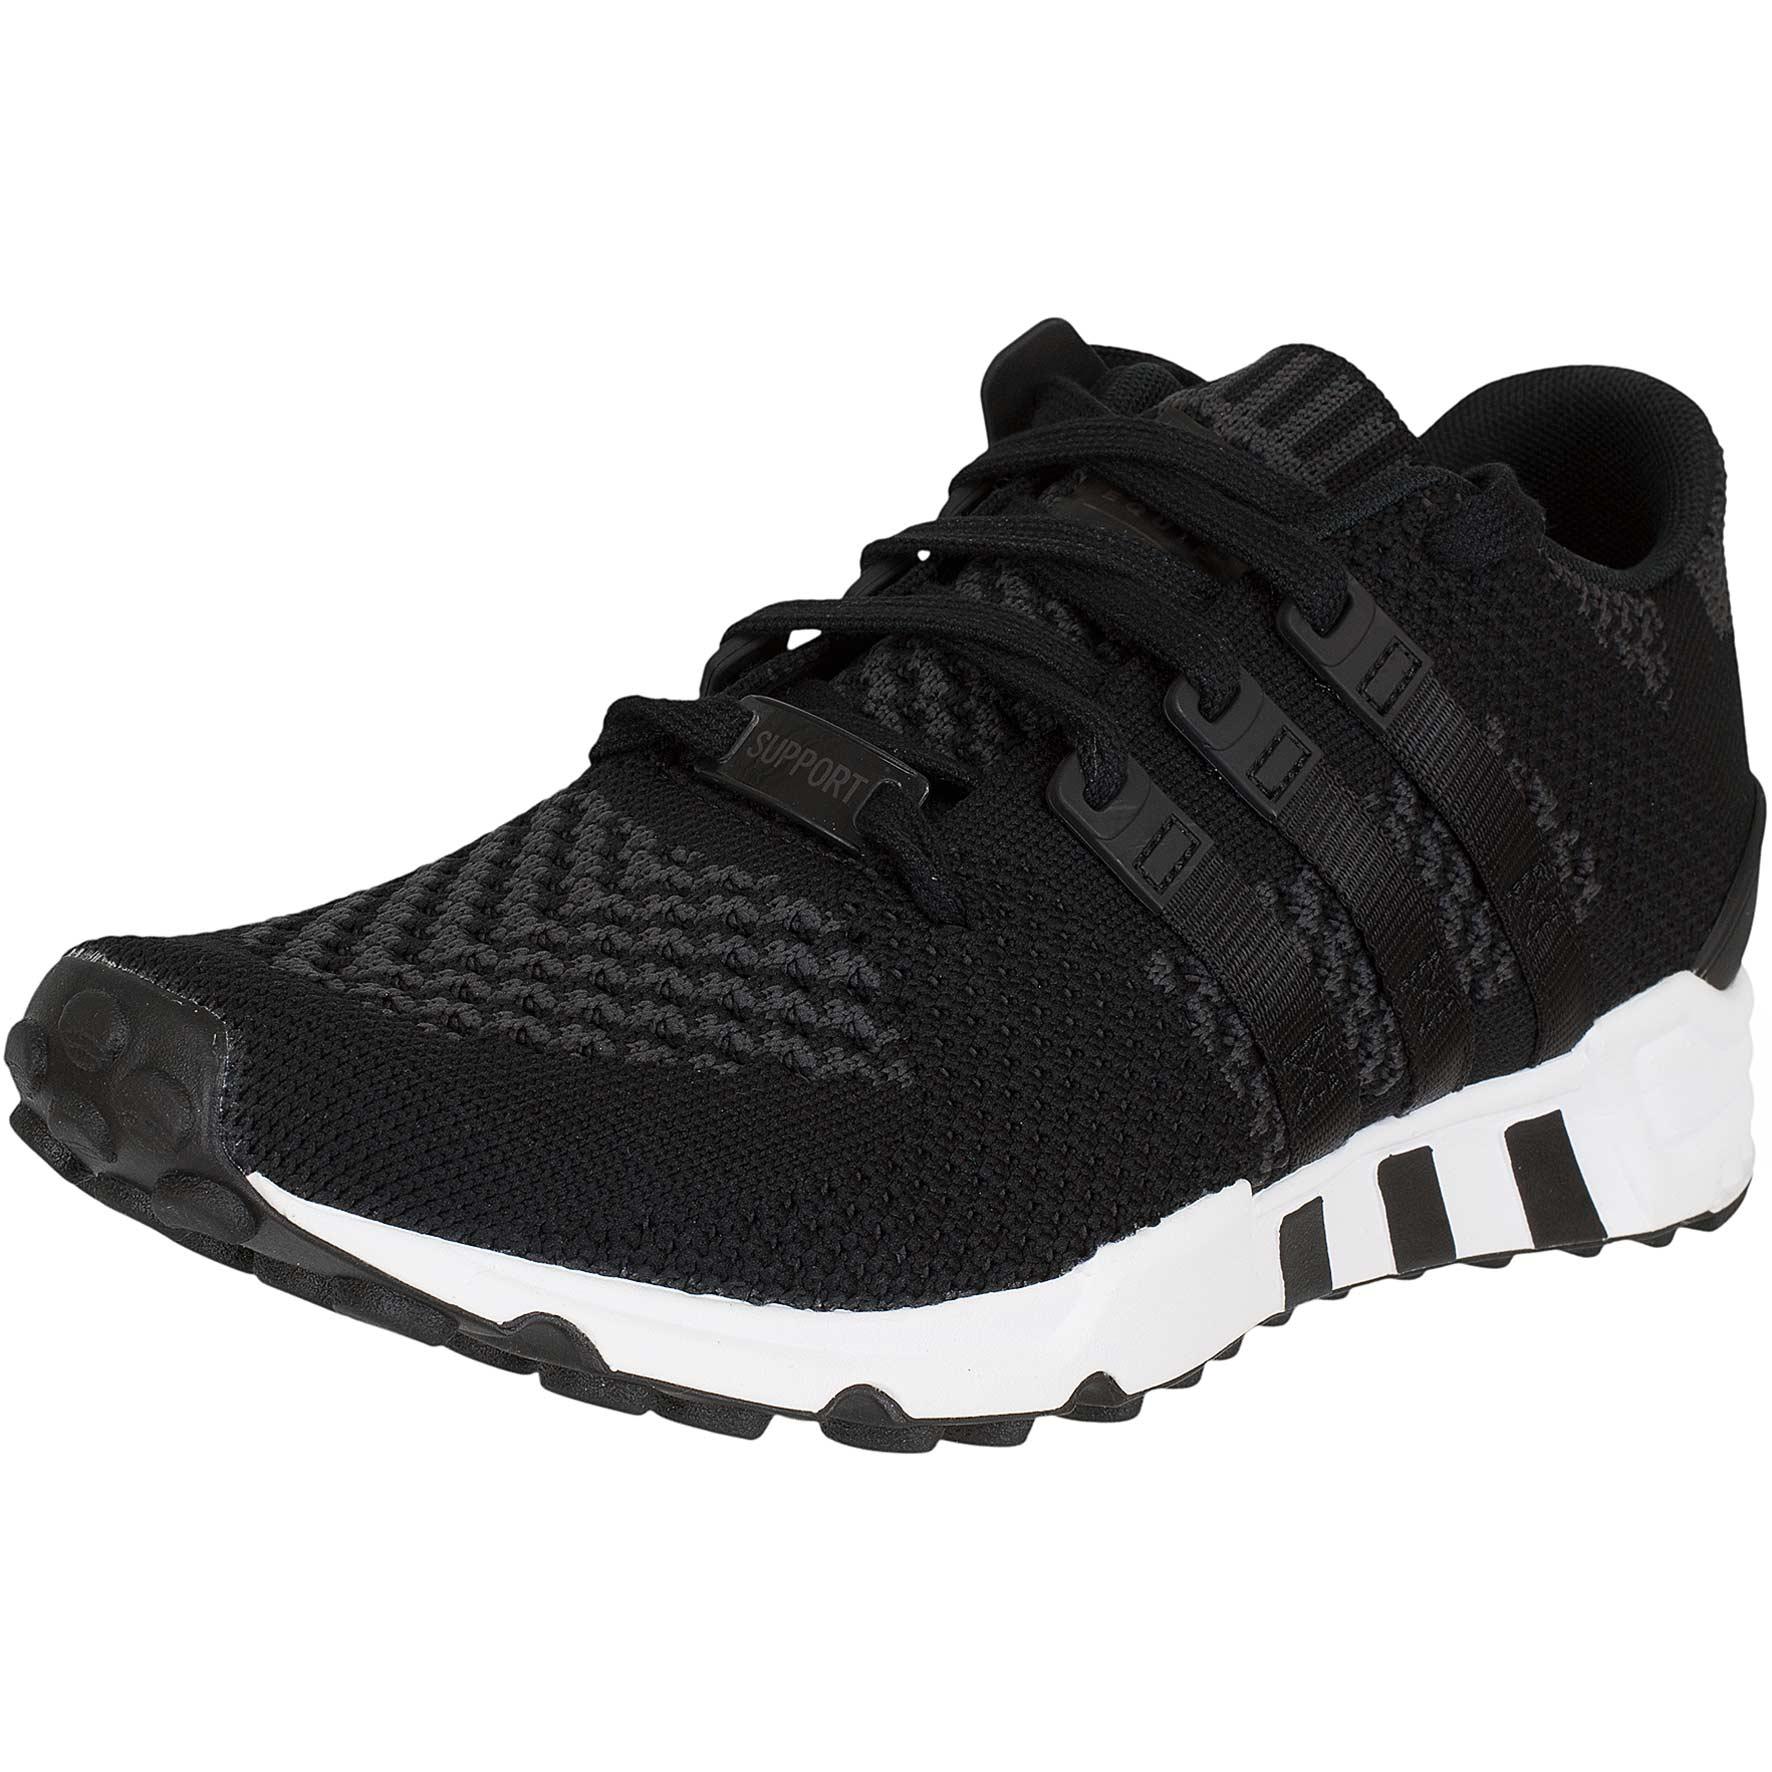 adidas originals equipment support rf primeknit sneaker